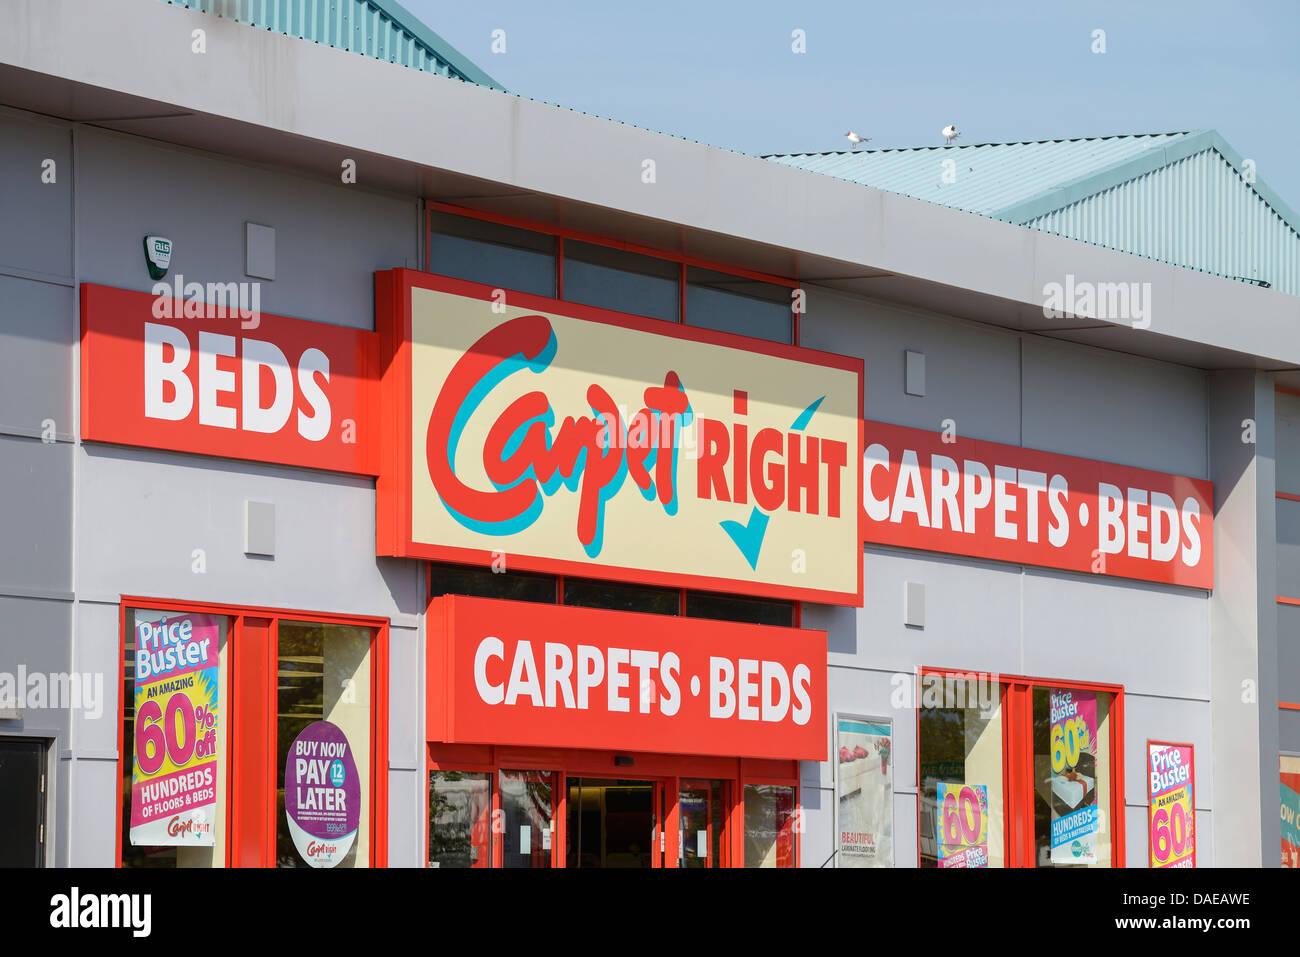 Teppich-richtige Retail-store Stockbild